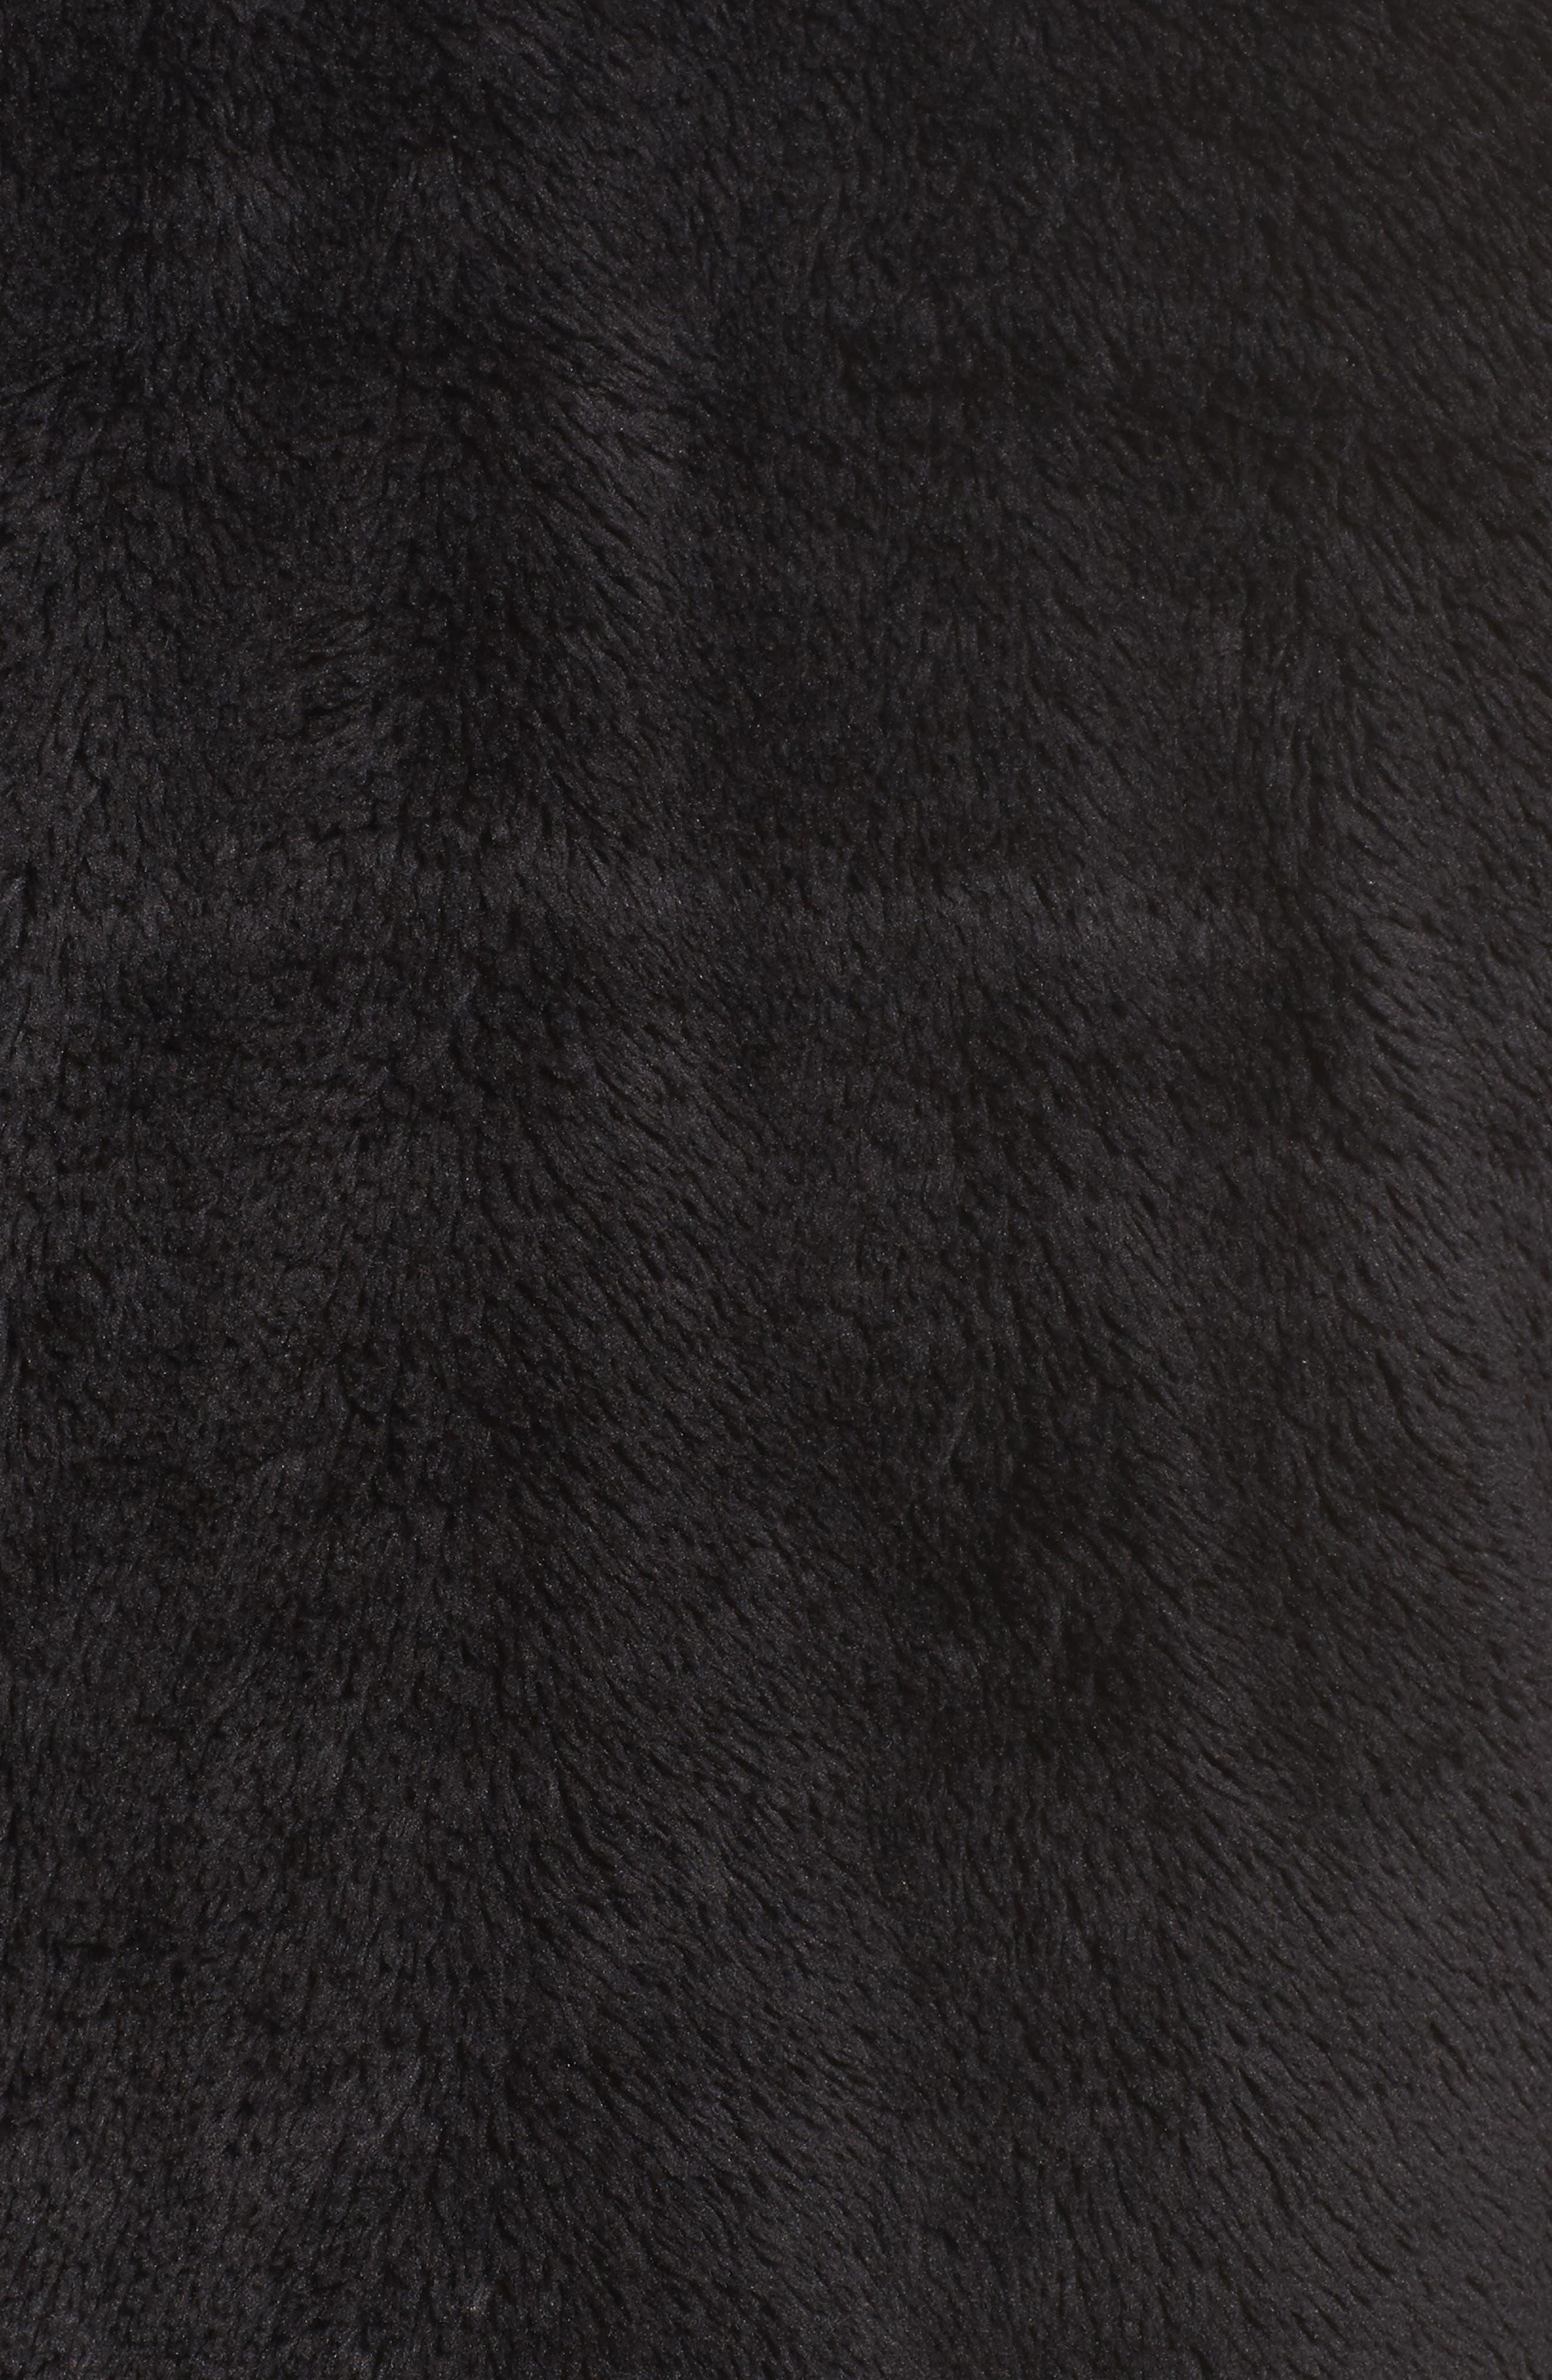 THE NORTH FACE, Furry Fleece Jacket, Alternate thumbnail 7, color, TNF BLACK